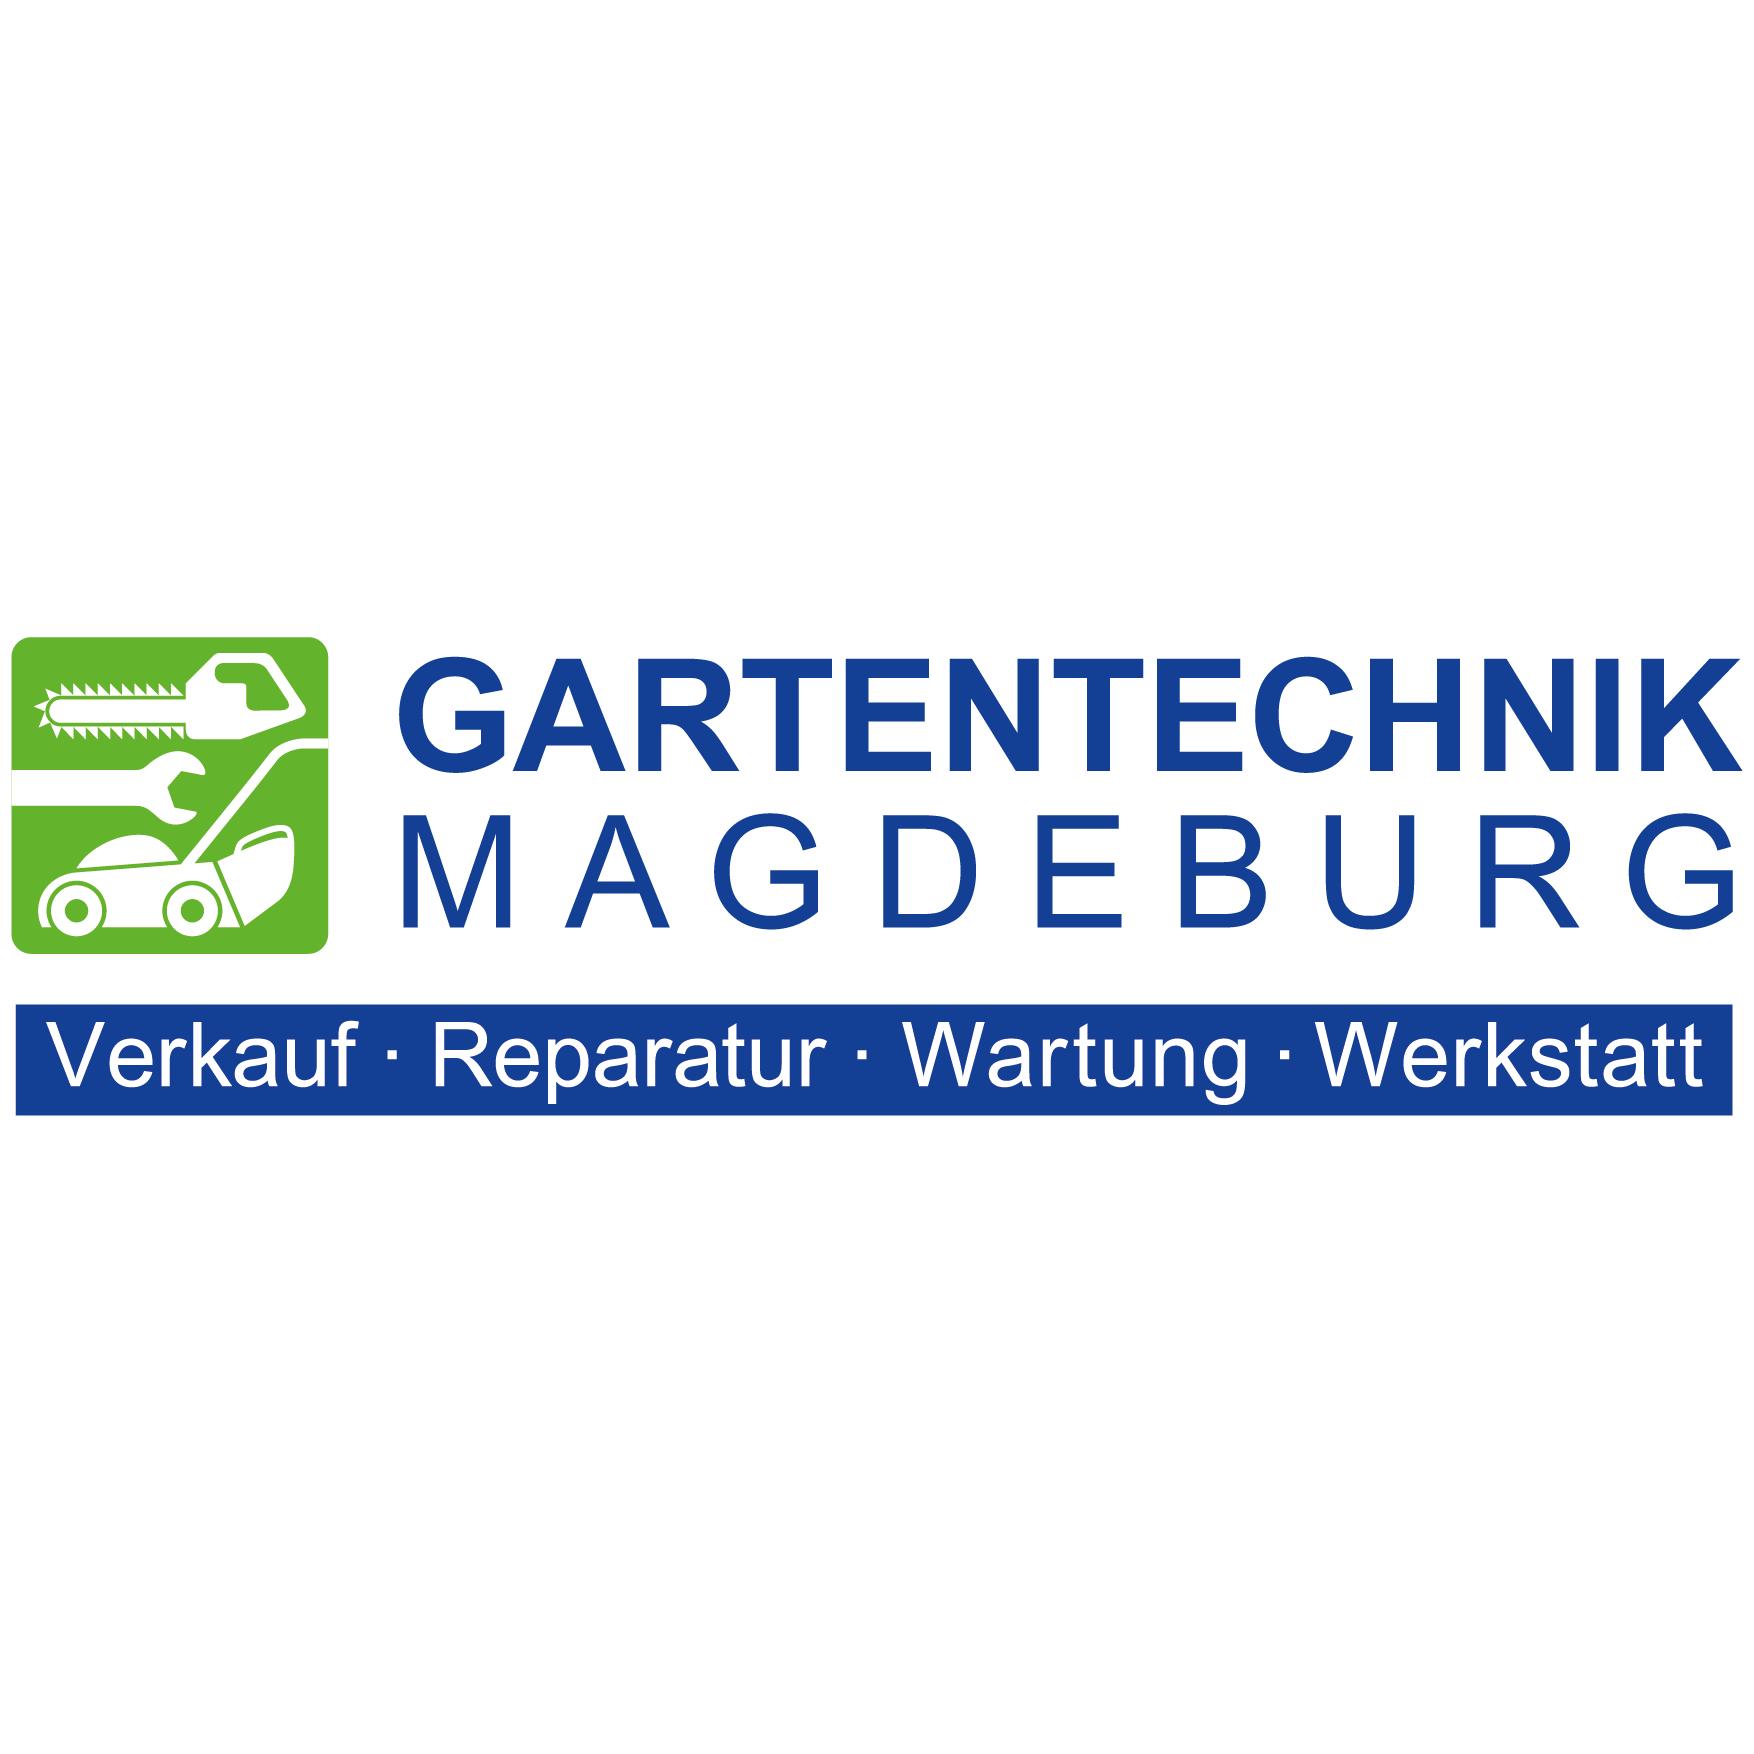 Gartentechnik Magdeburg Marco Gerlach & Tino Meier GbR in Magdeburg